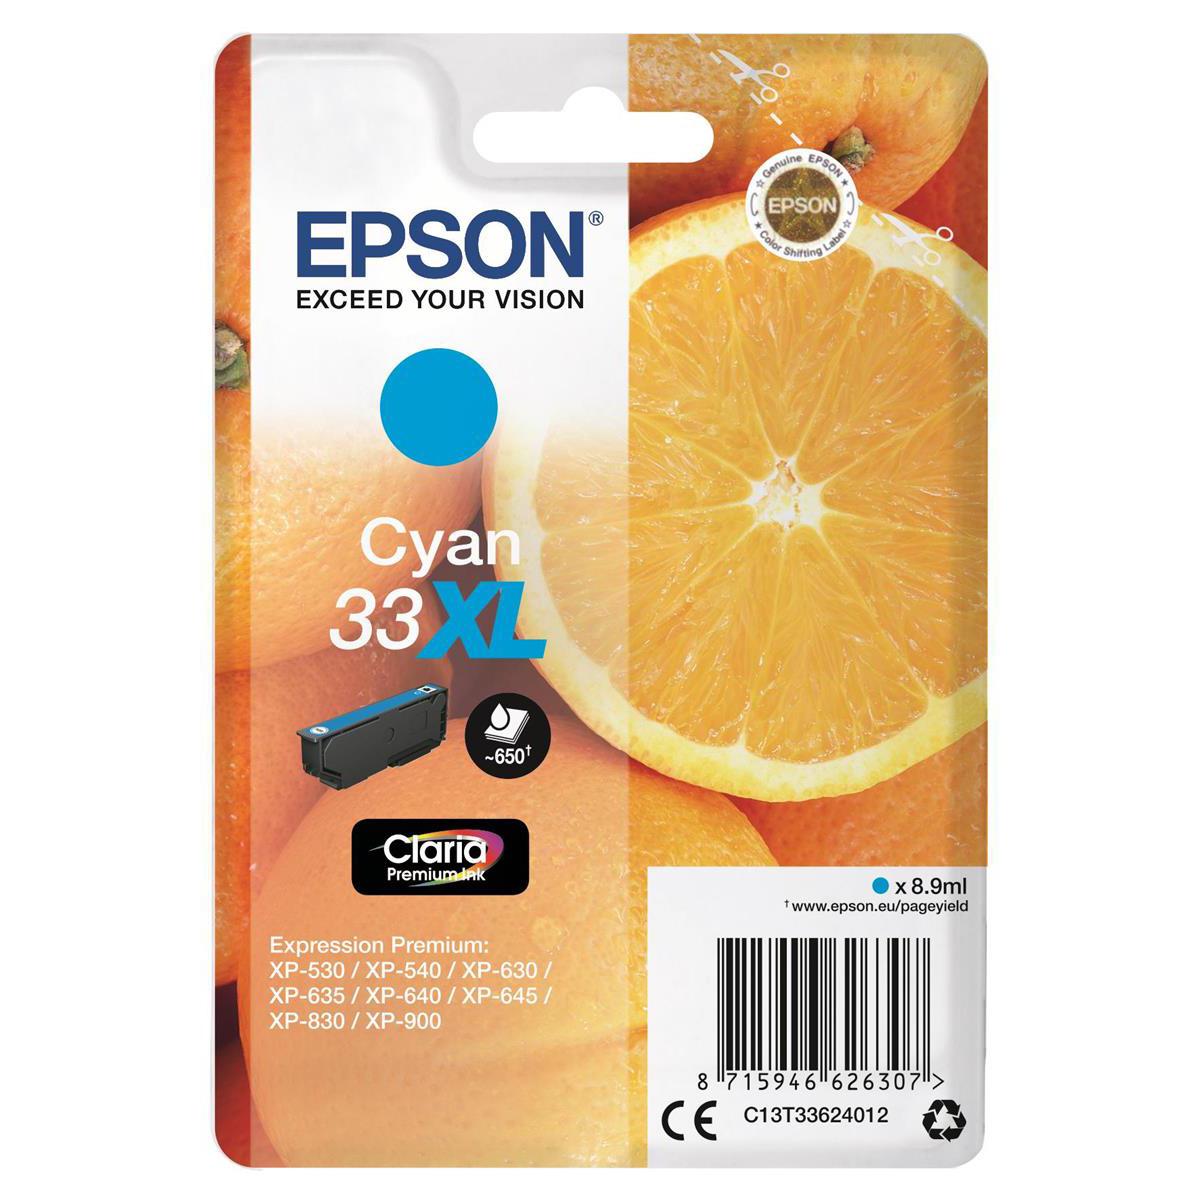 Ink cartridges Epson T33XL Inkjet Cartridge Orange High Yield Page Life 650pp 8.9ml Cyan Ref C13T33624012